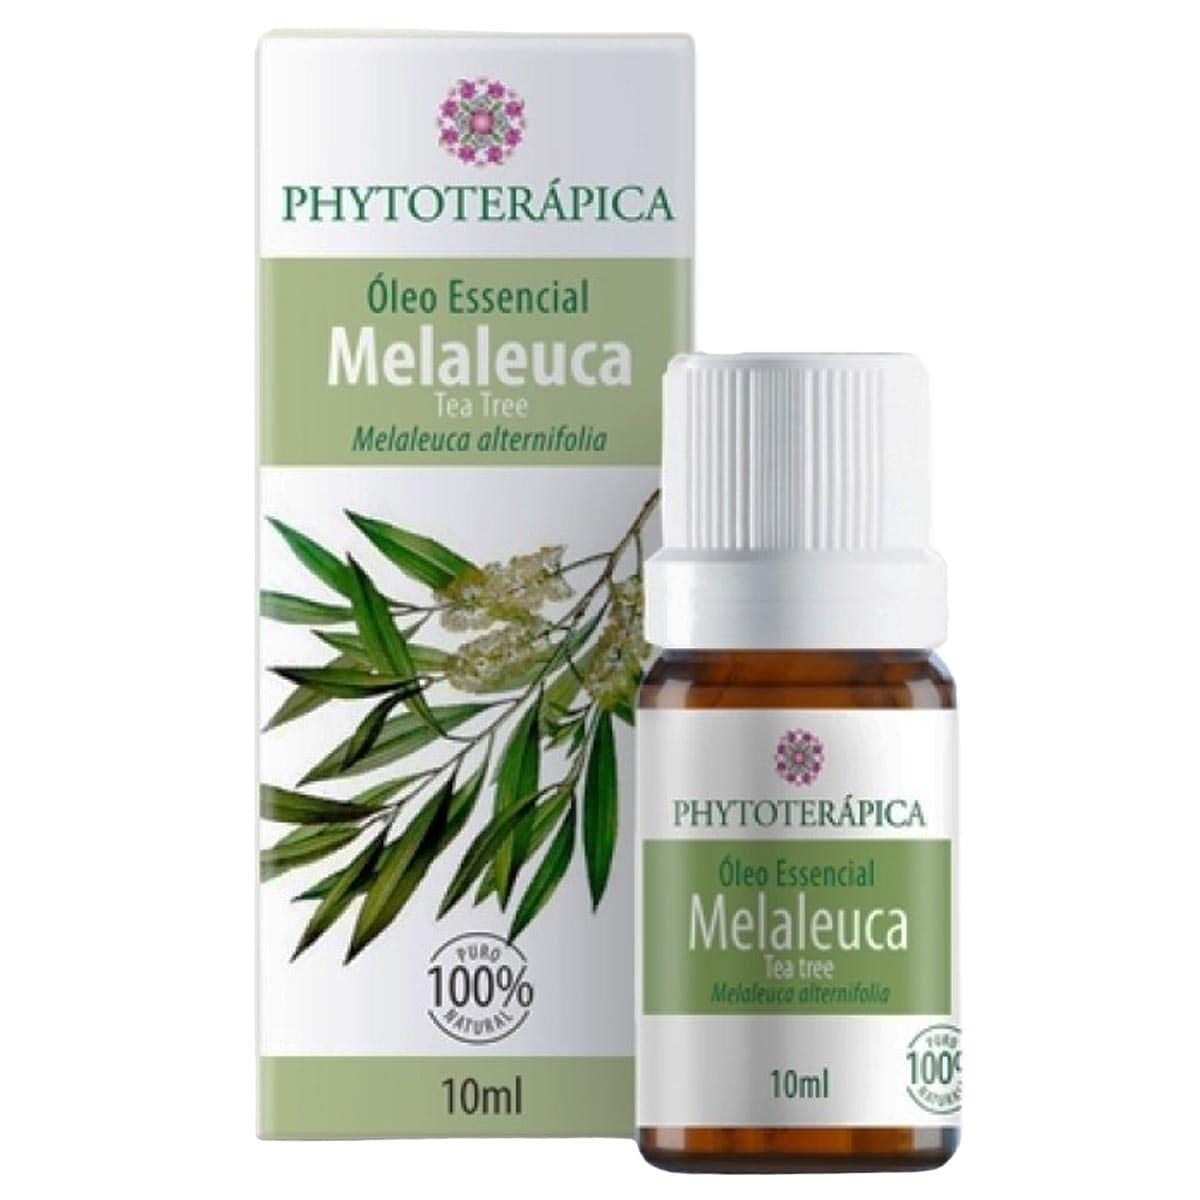 Óleo Essencial Melaleuca Tea Tree 10ml Phytoterápica